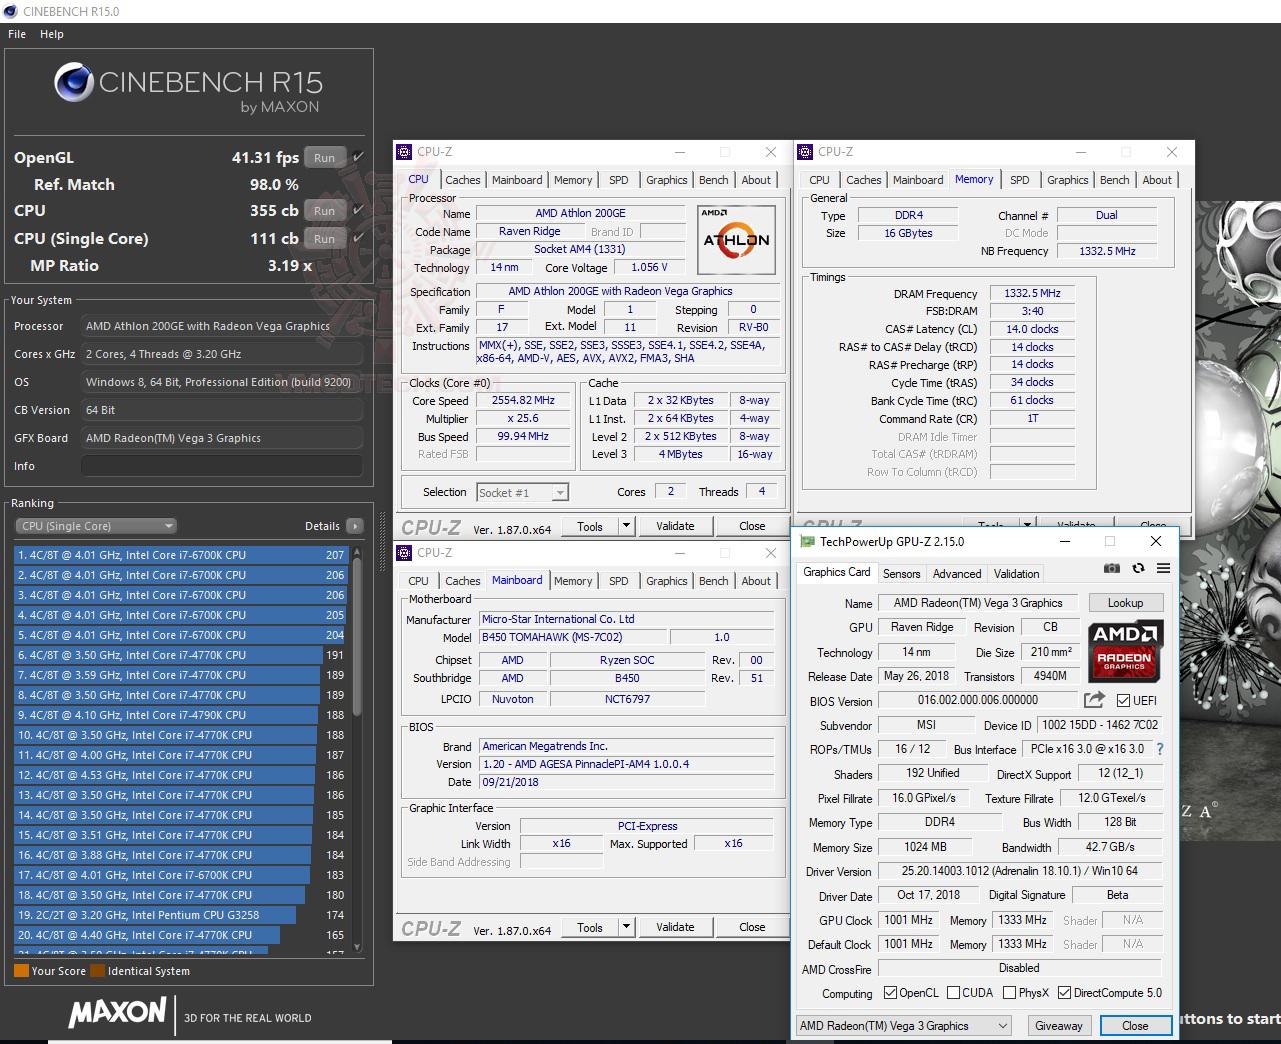 c15 AMD Athlon 200GE Processor with Radeon Vega 3 Graphics Review